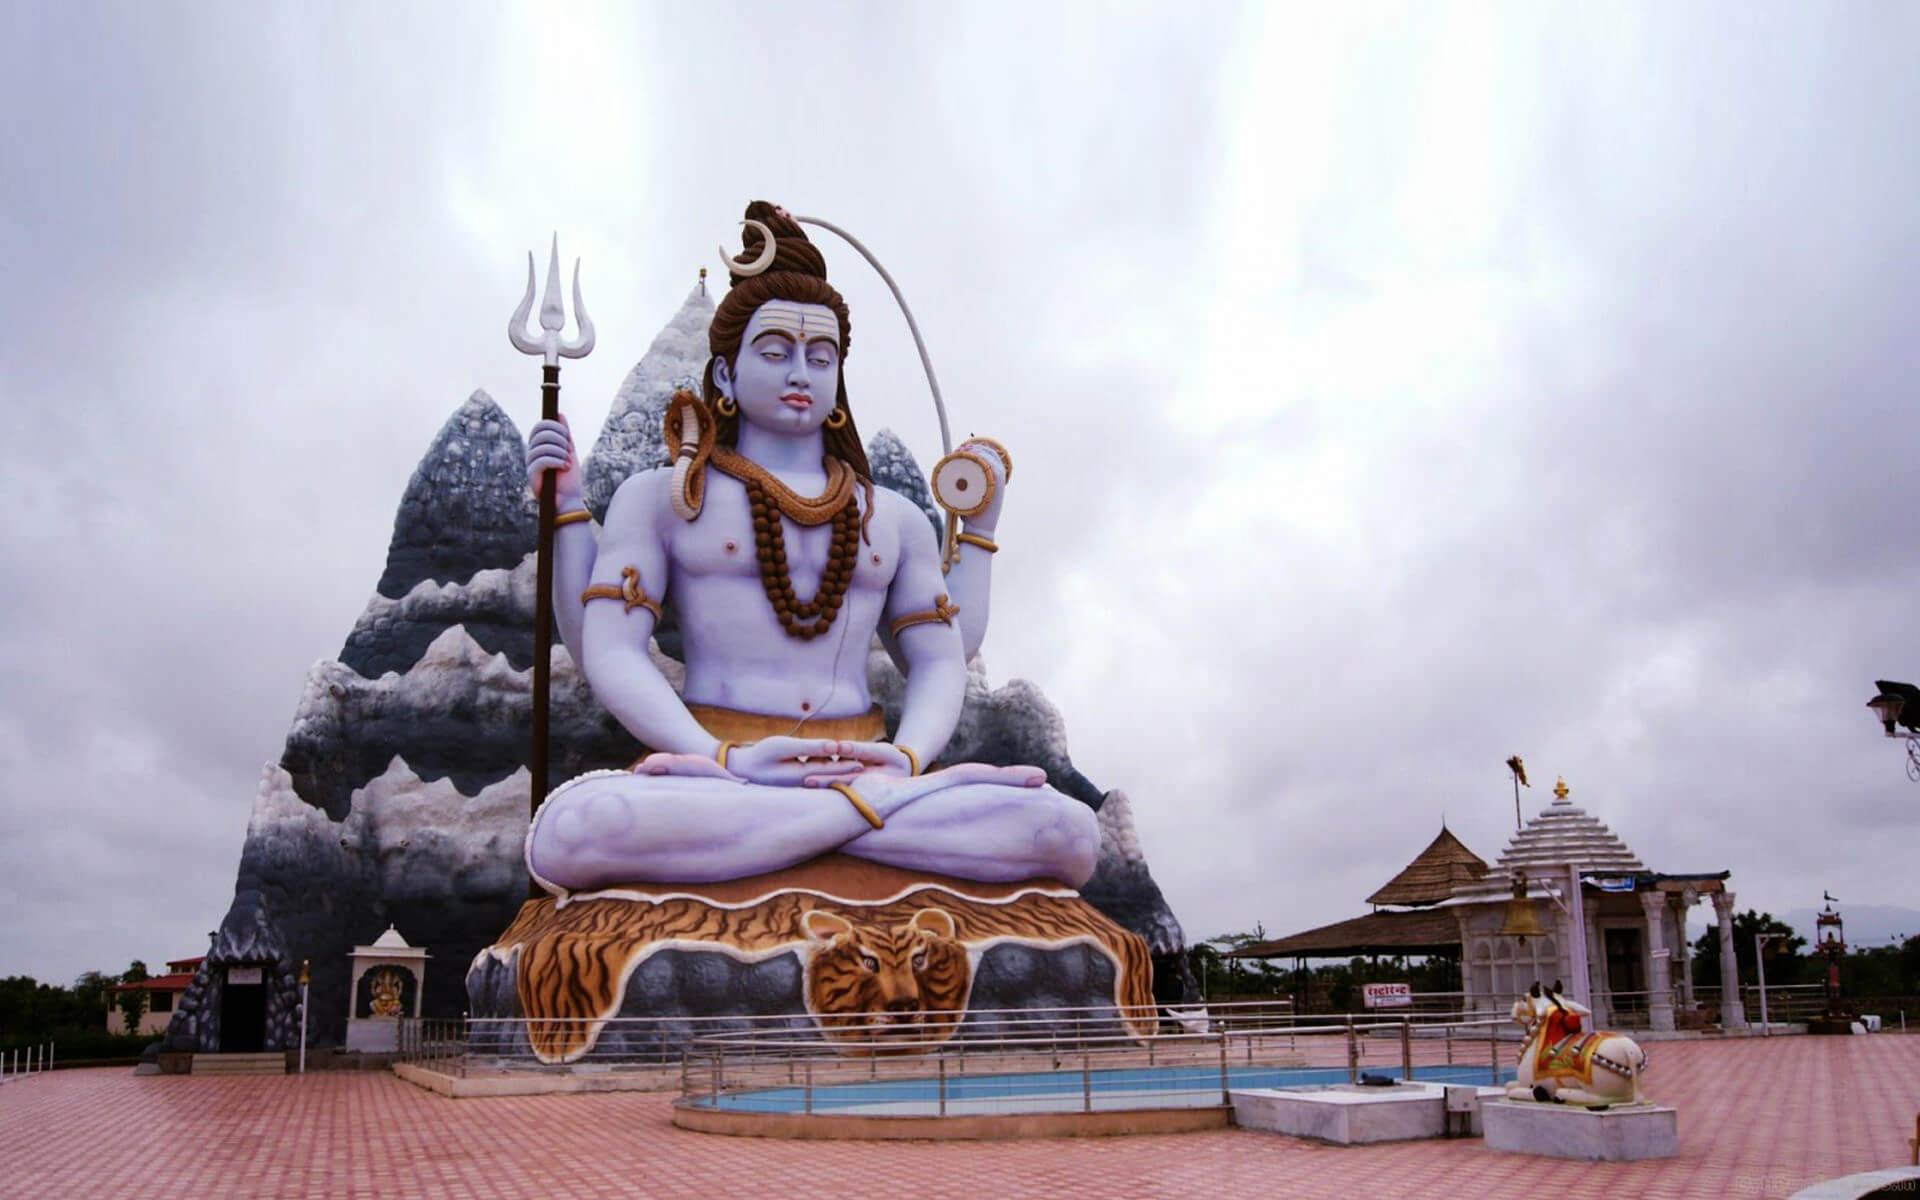 Hindu God Shiva Sculpture   God   Know Your Meme